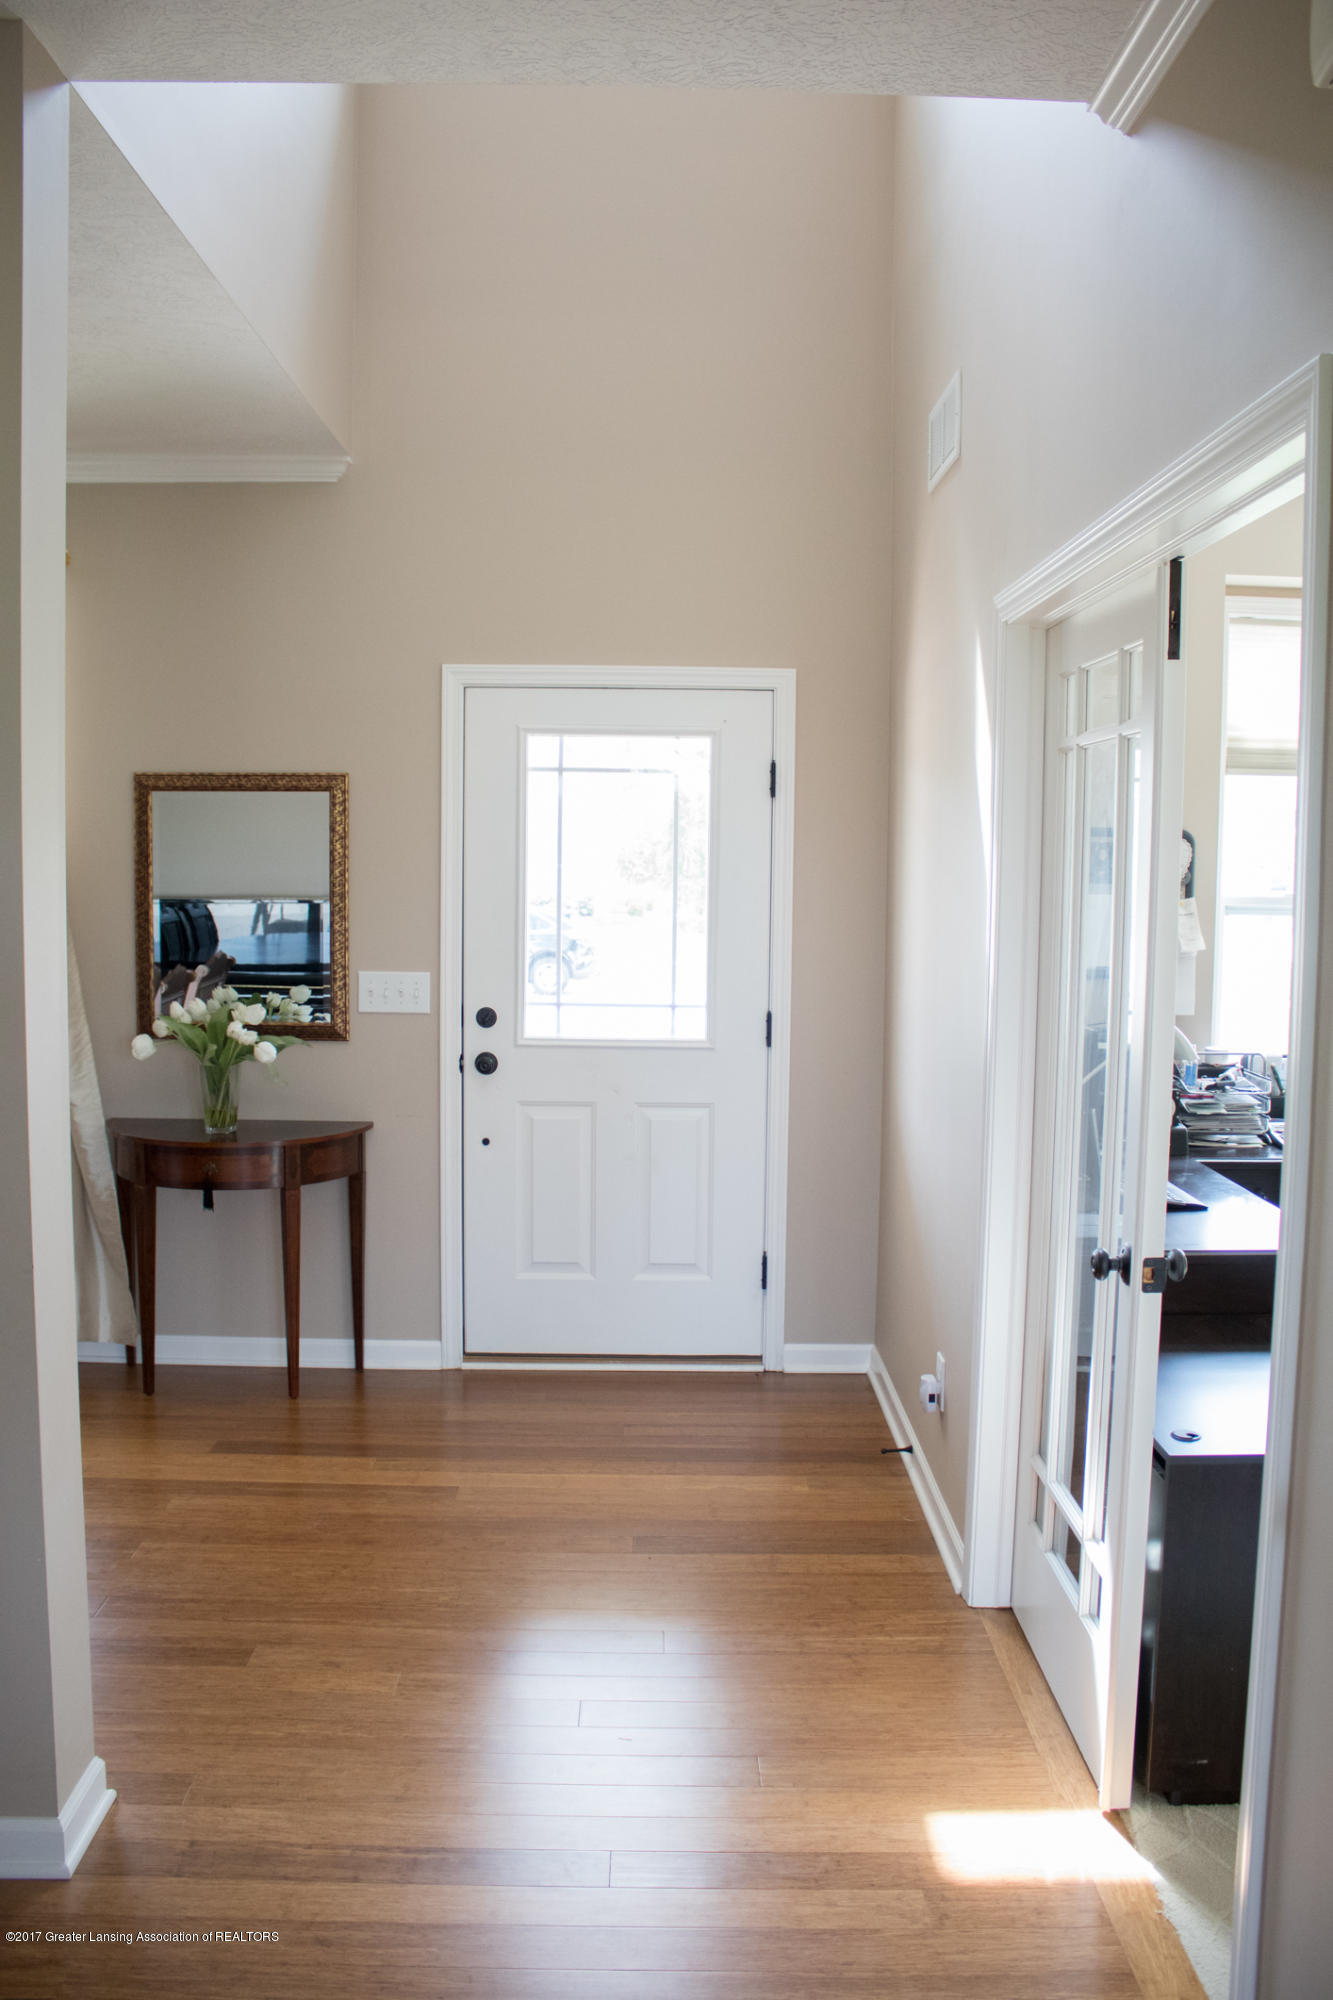 2550 Lupine Ct - Foyer - 10